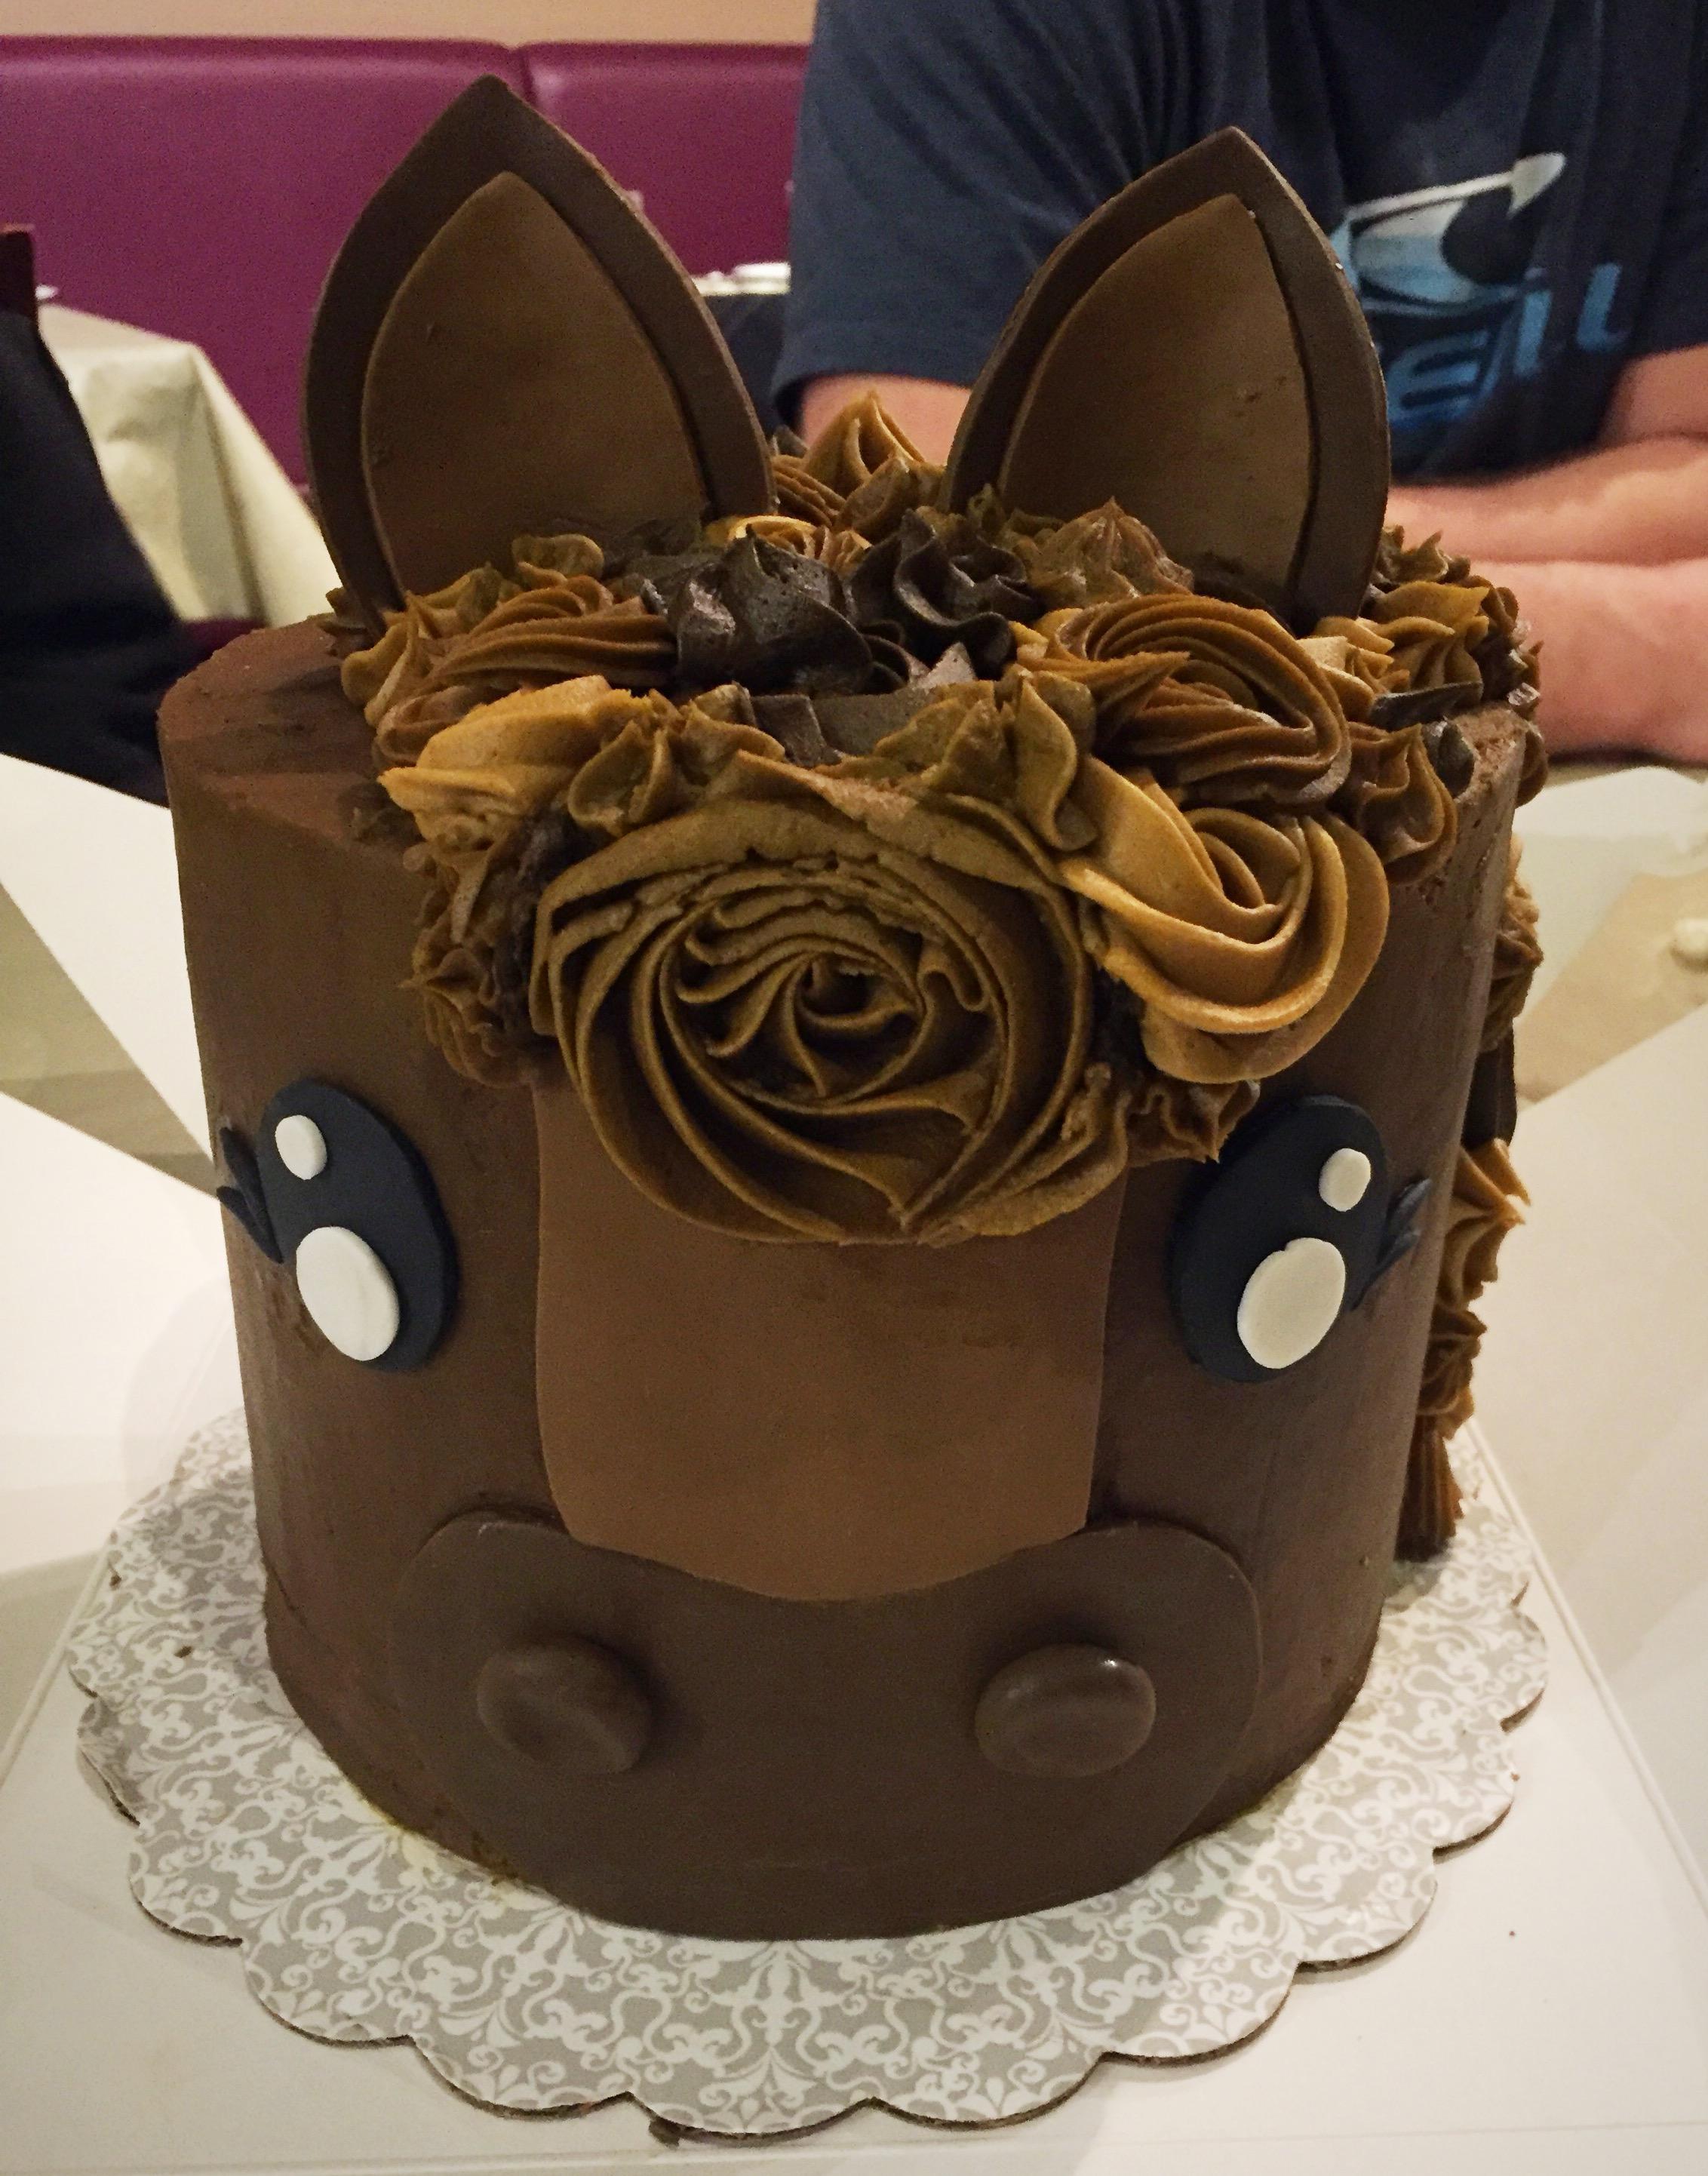 Surprise 30th birthday